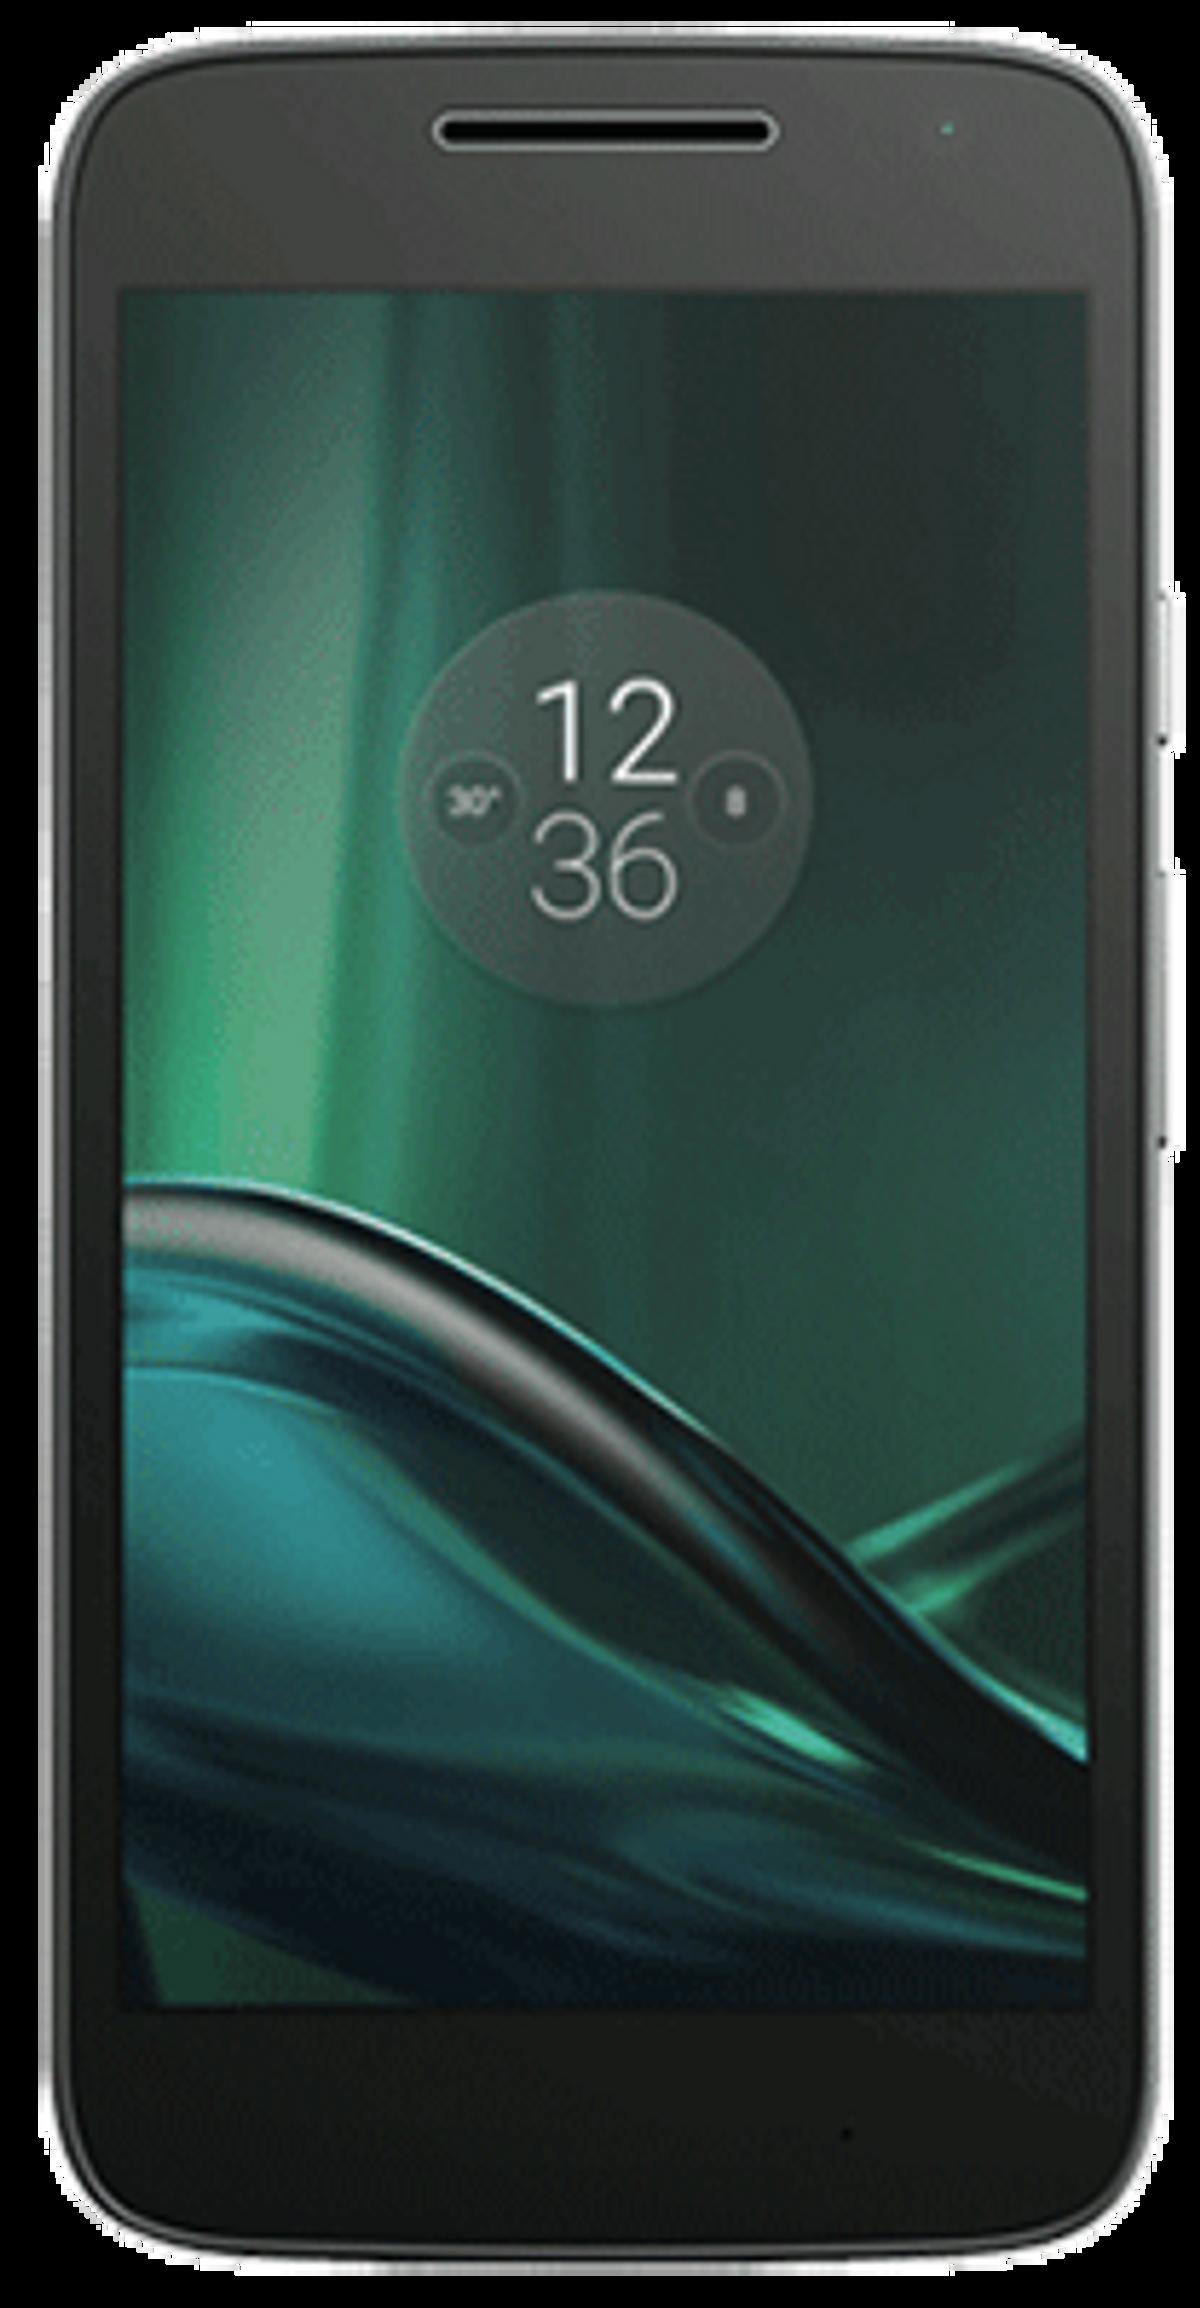 मोटोरोला Moto G4 Play